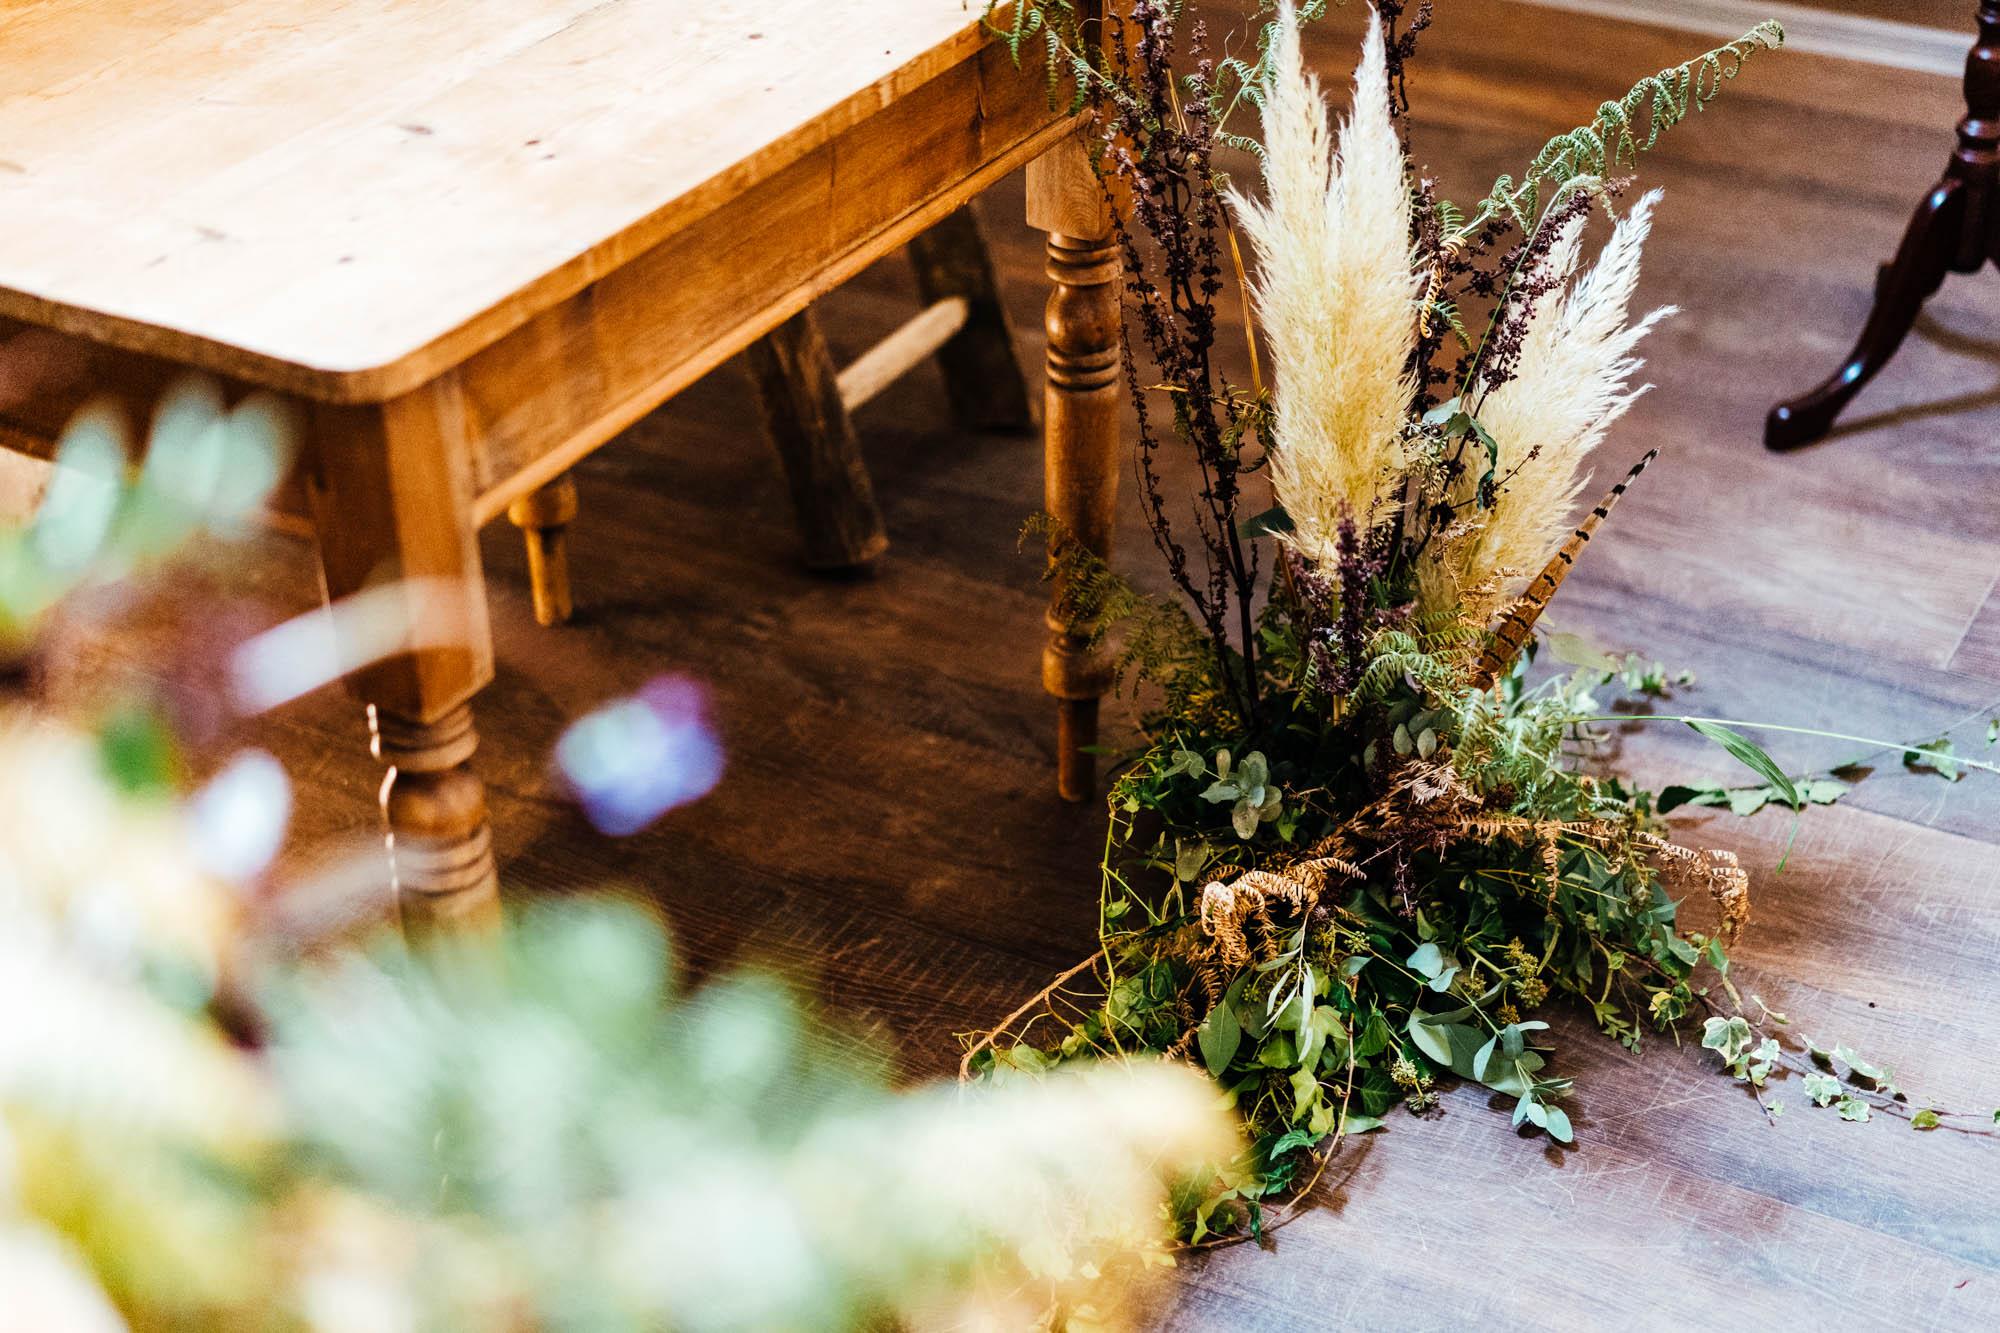 huntsmill-farm-wedding-inspiration-13